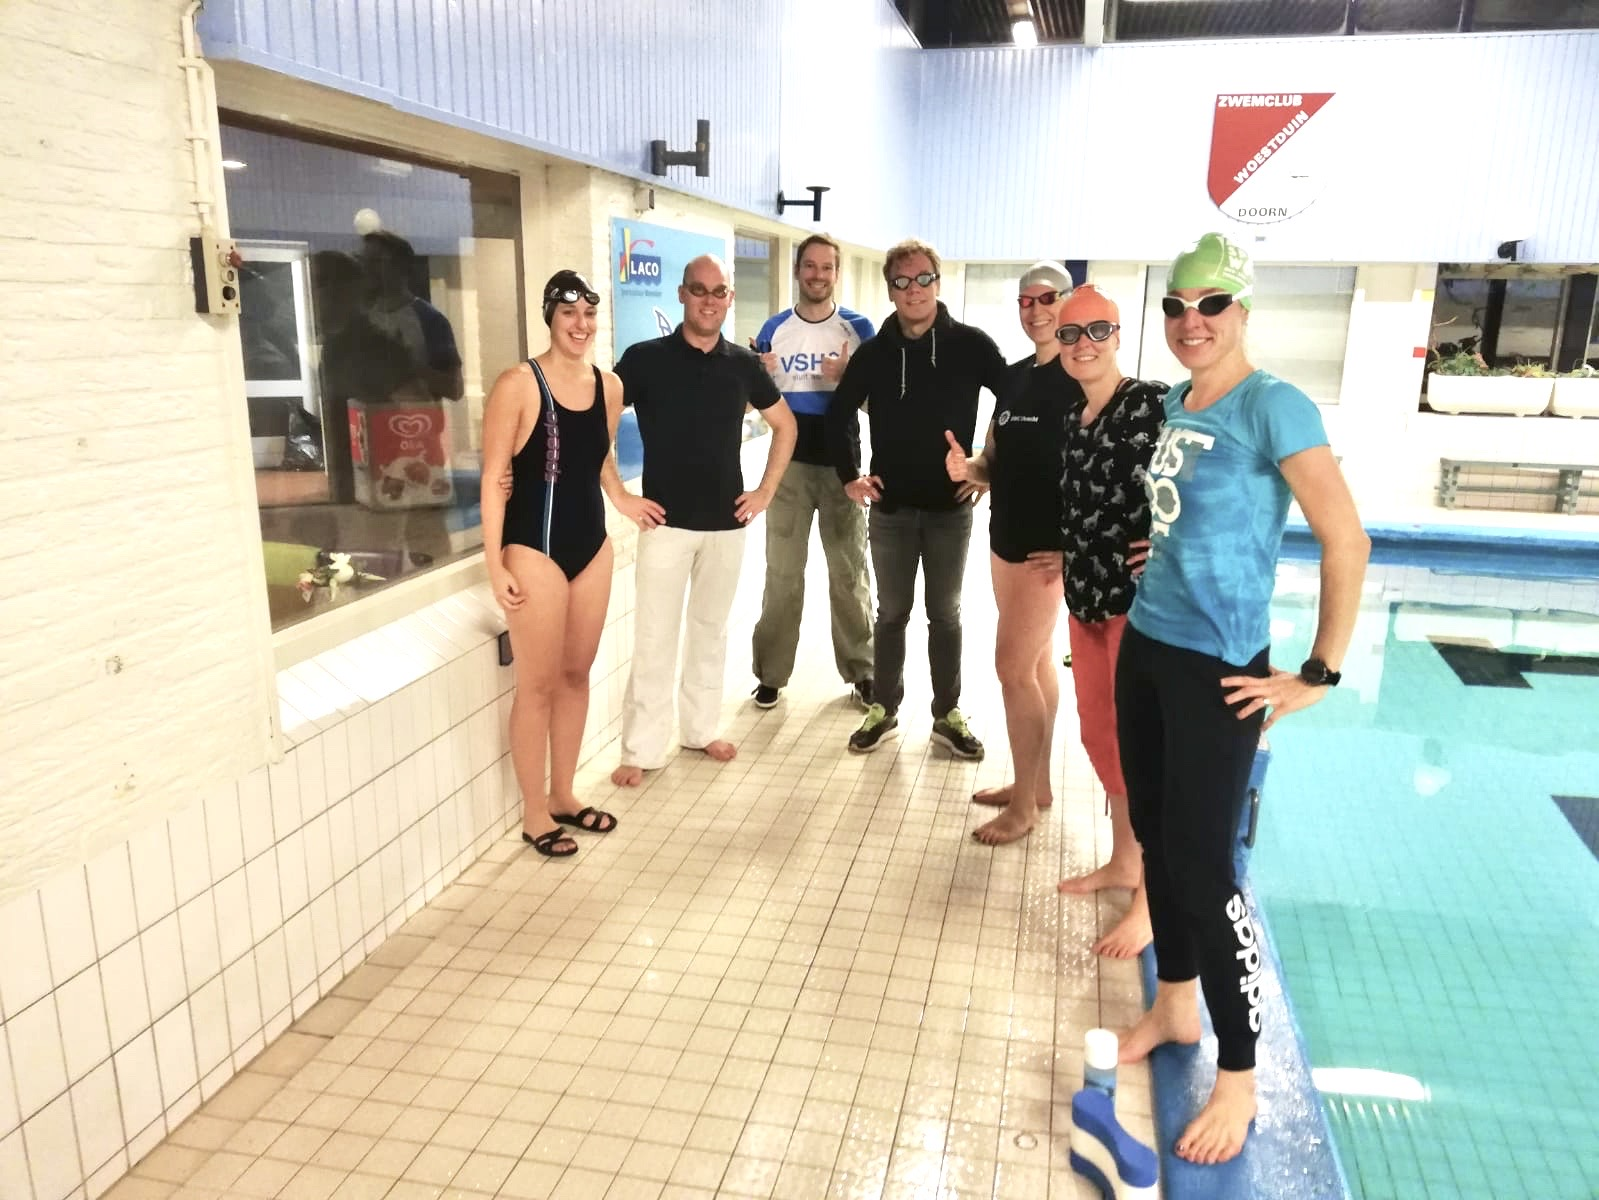 vereniging - UHTT reddend zwemmen clinic - Triathlon training in de herfst en winter bij UHTT: hoe doen we dat? - Zwemmen, winter, triathlon training, programma, MTB, Hardlopen, Fietsen